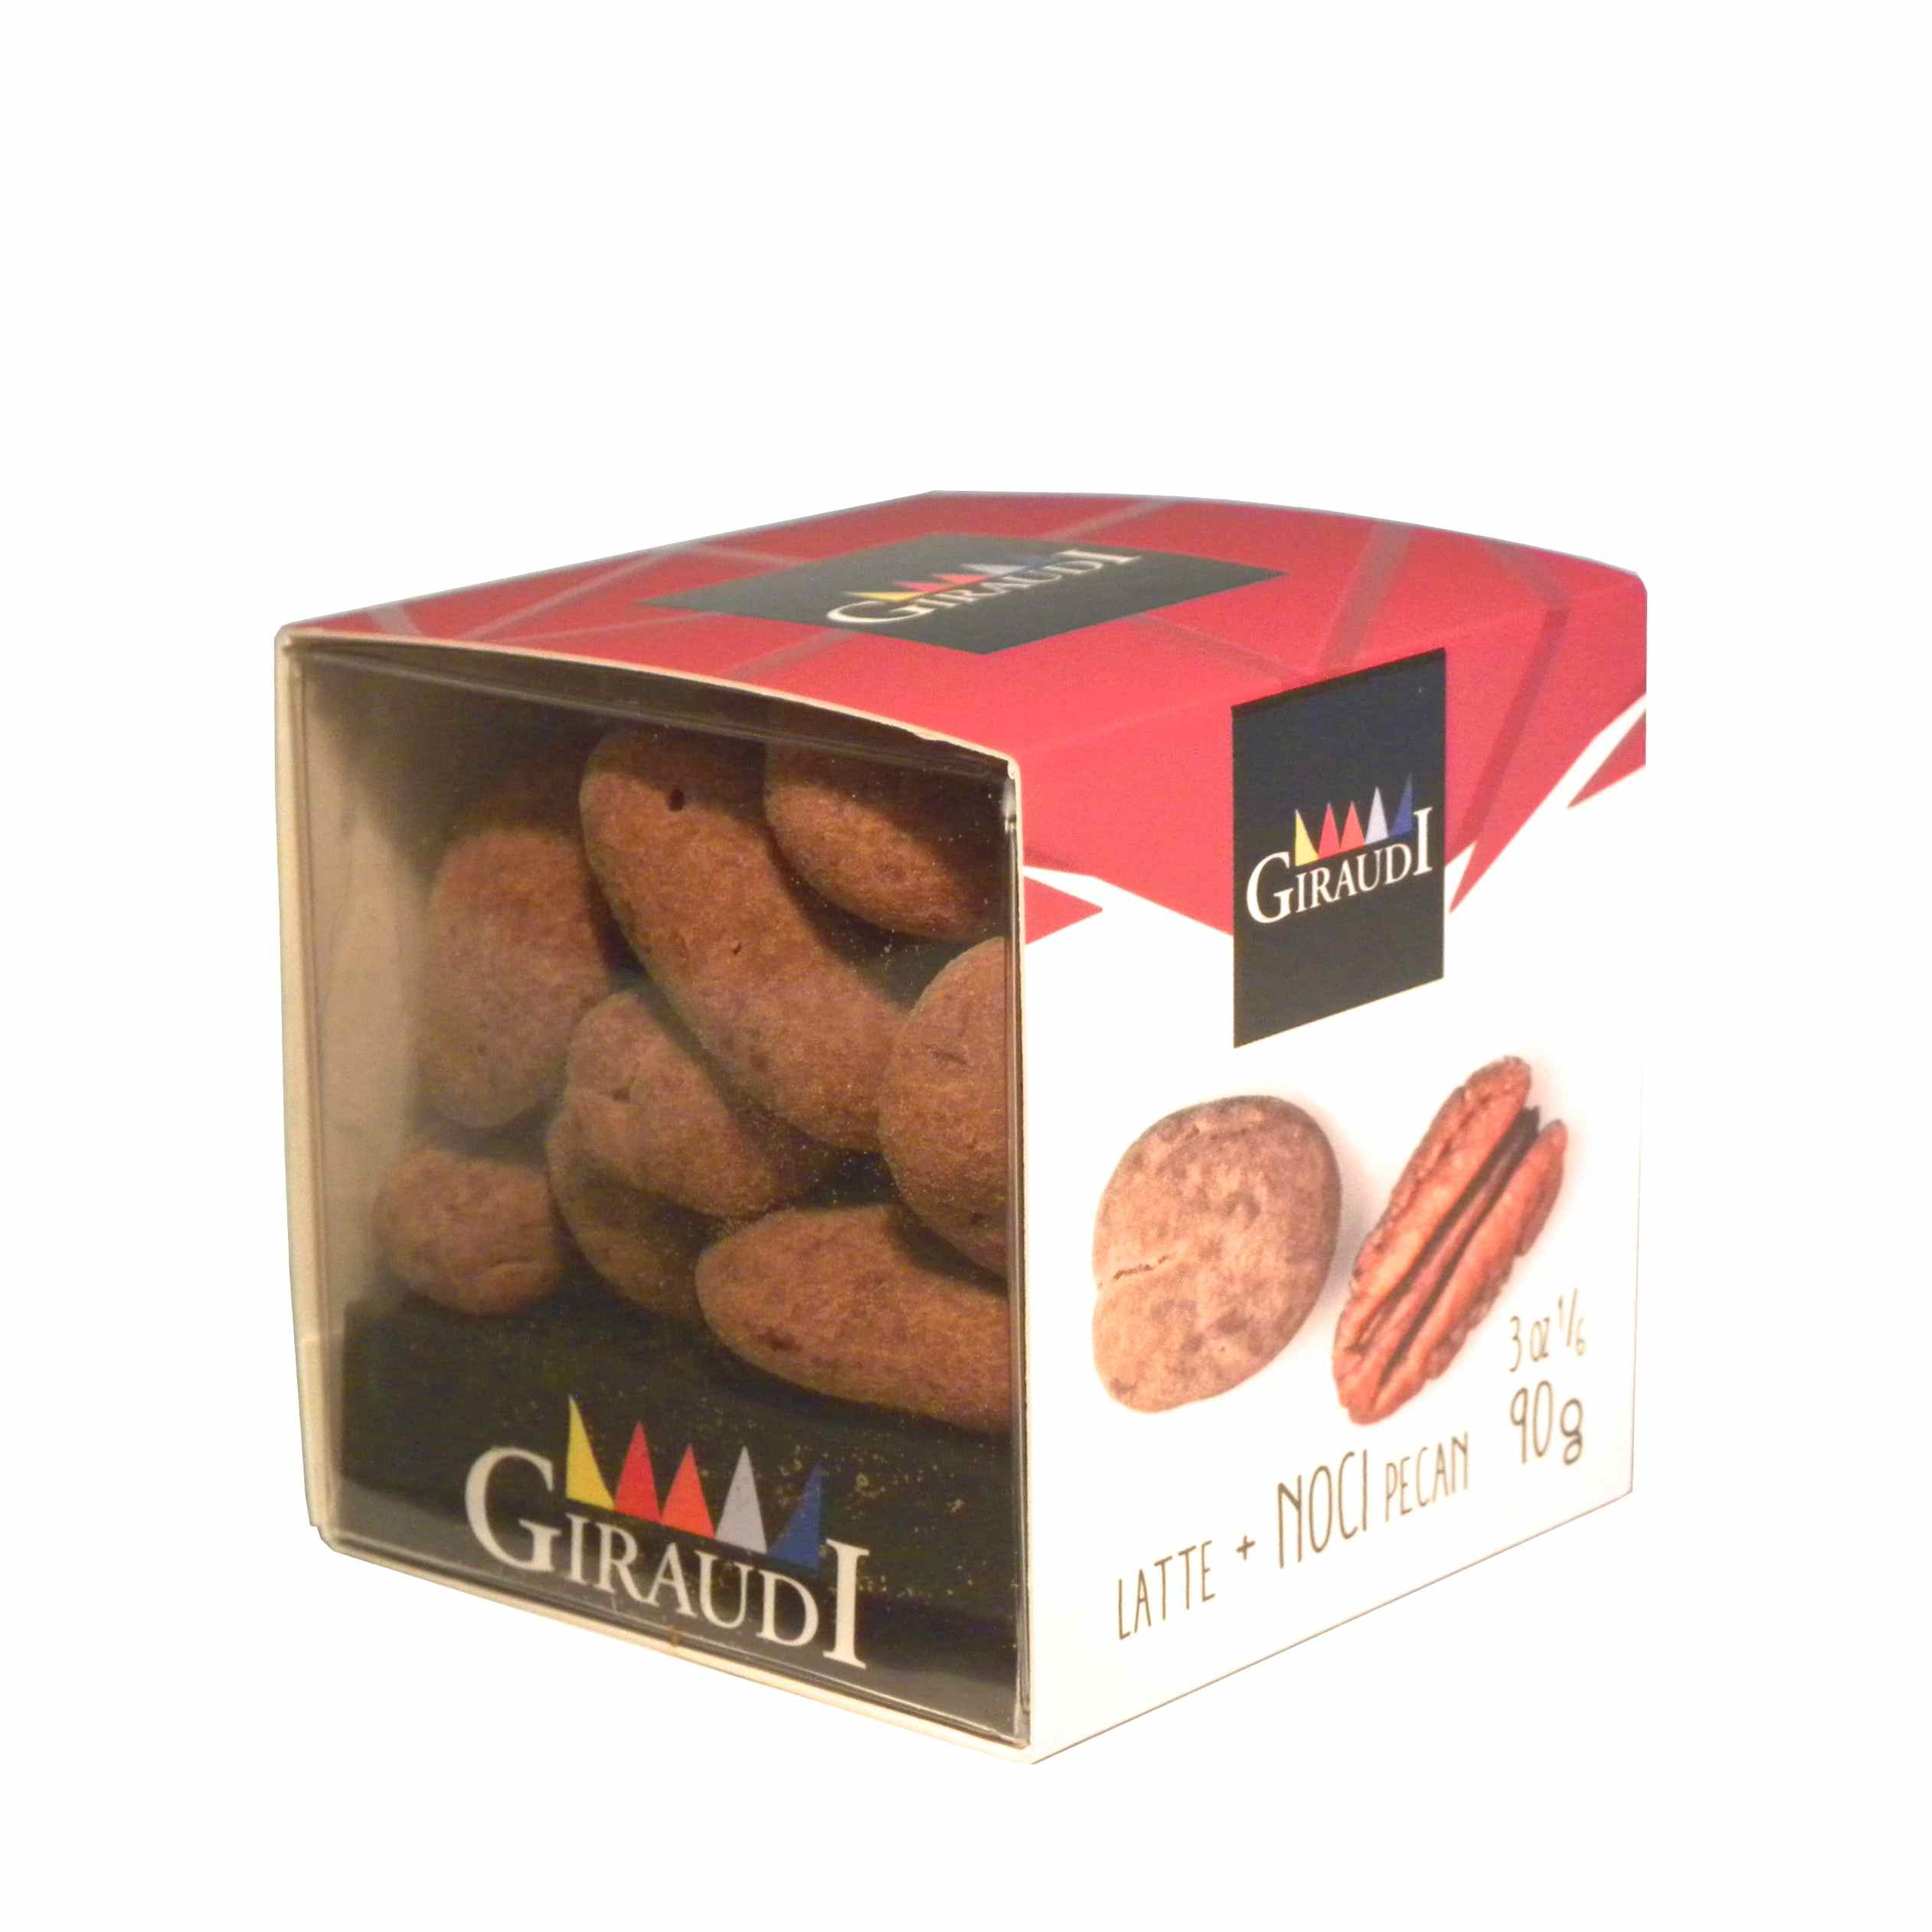 Giraudi chocolate Pecan walnuts – Giraudi dragee cioccolato noci Pecan – Gustorotondo – Italian food boutique